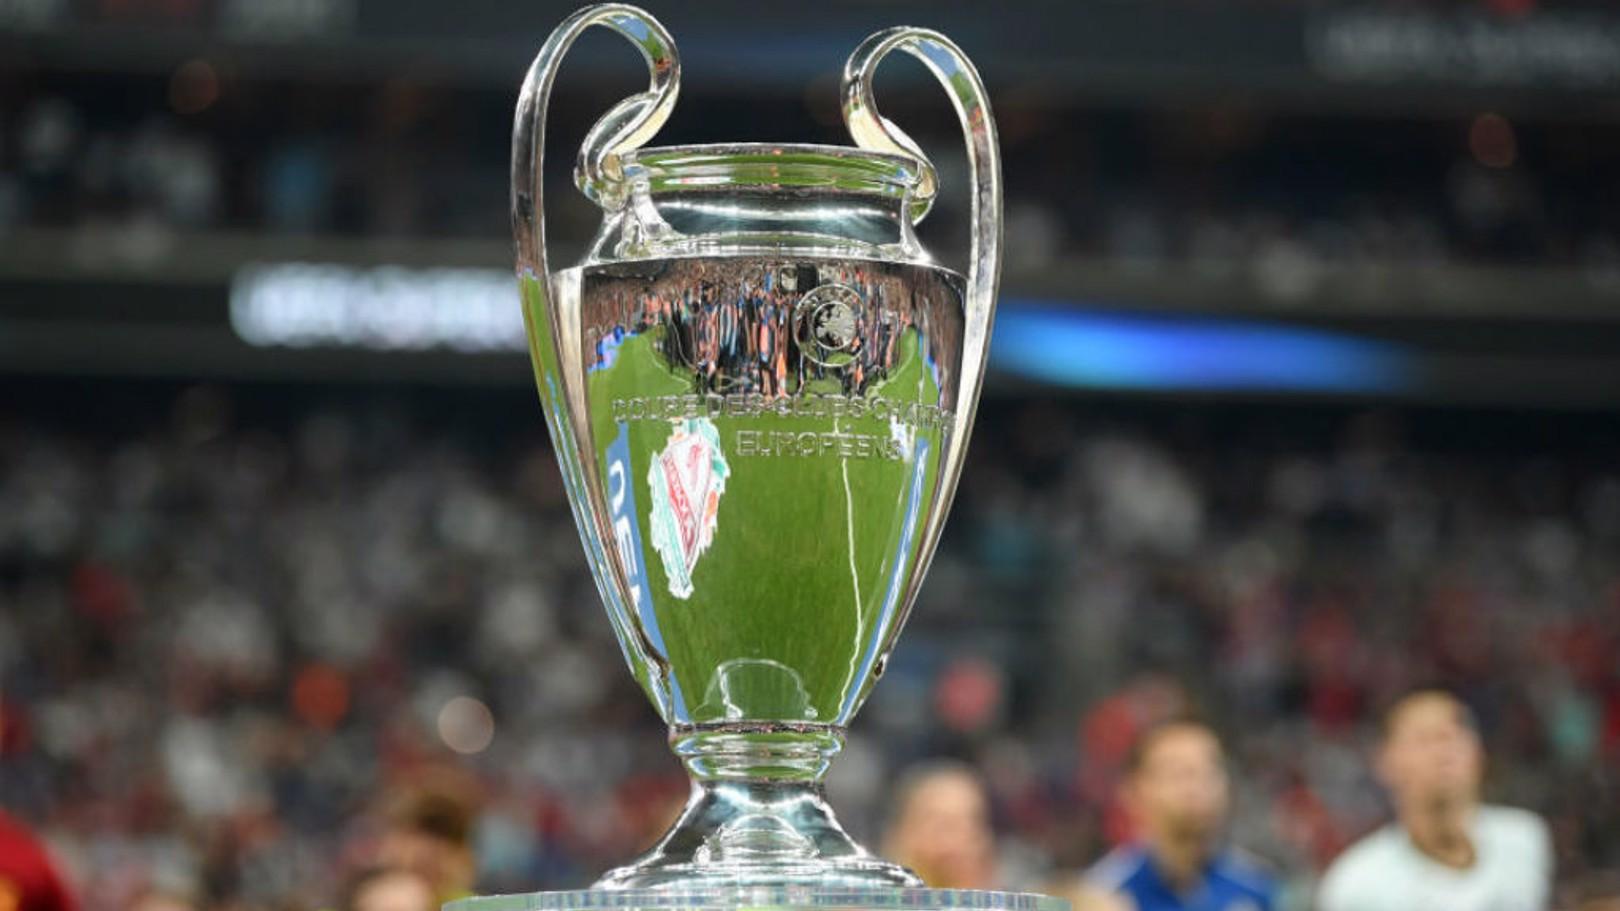 UEFA Champions League squad confirmed